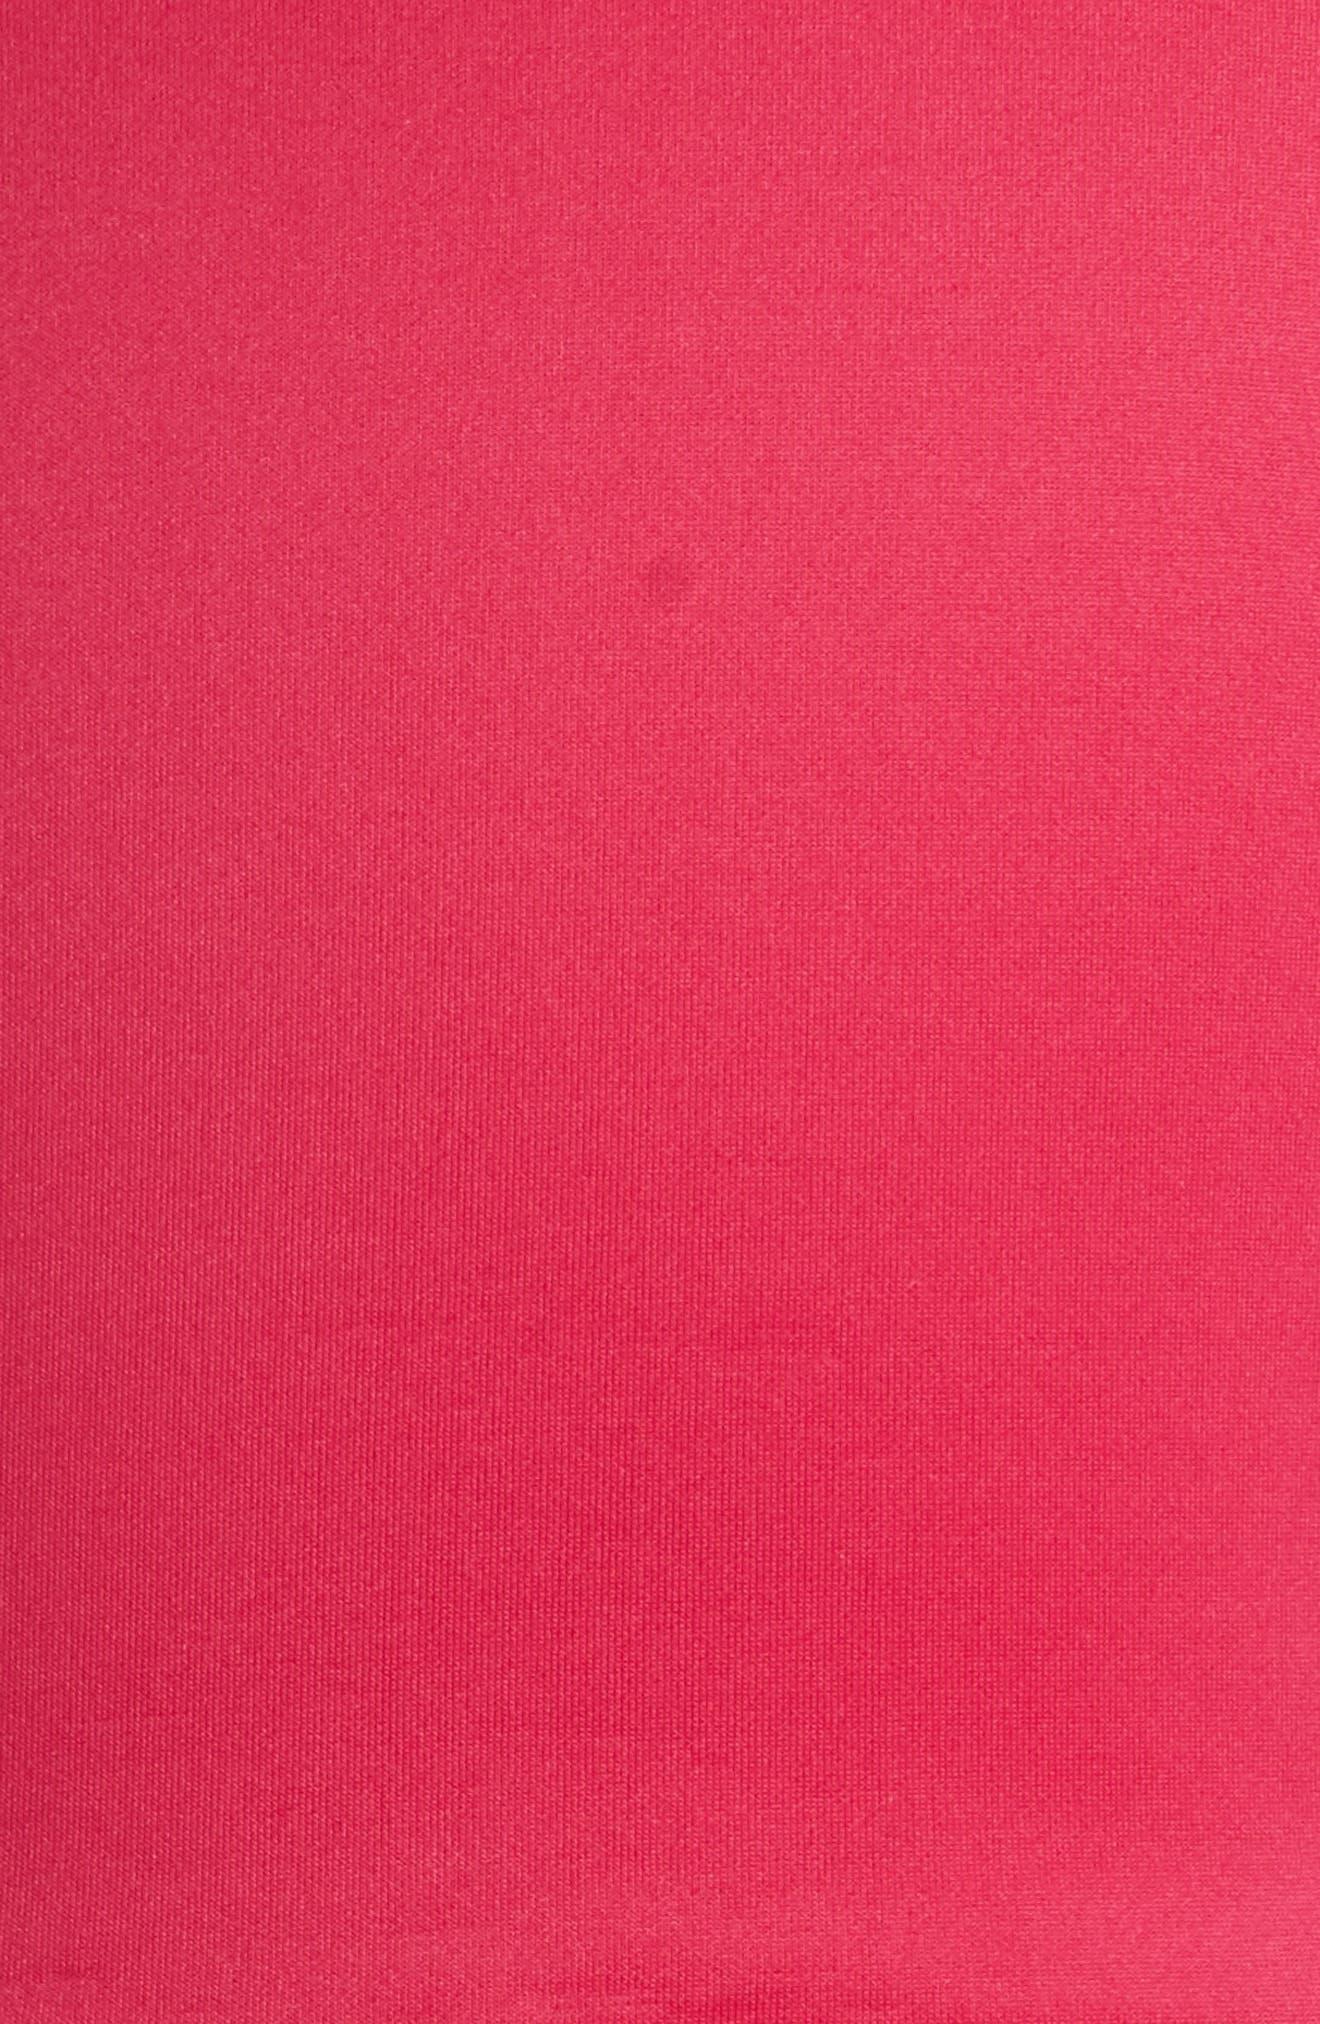 Scuba Fit & Flare Dress,                             Alternate thumbnail 3, color,                             652